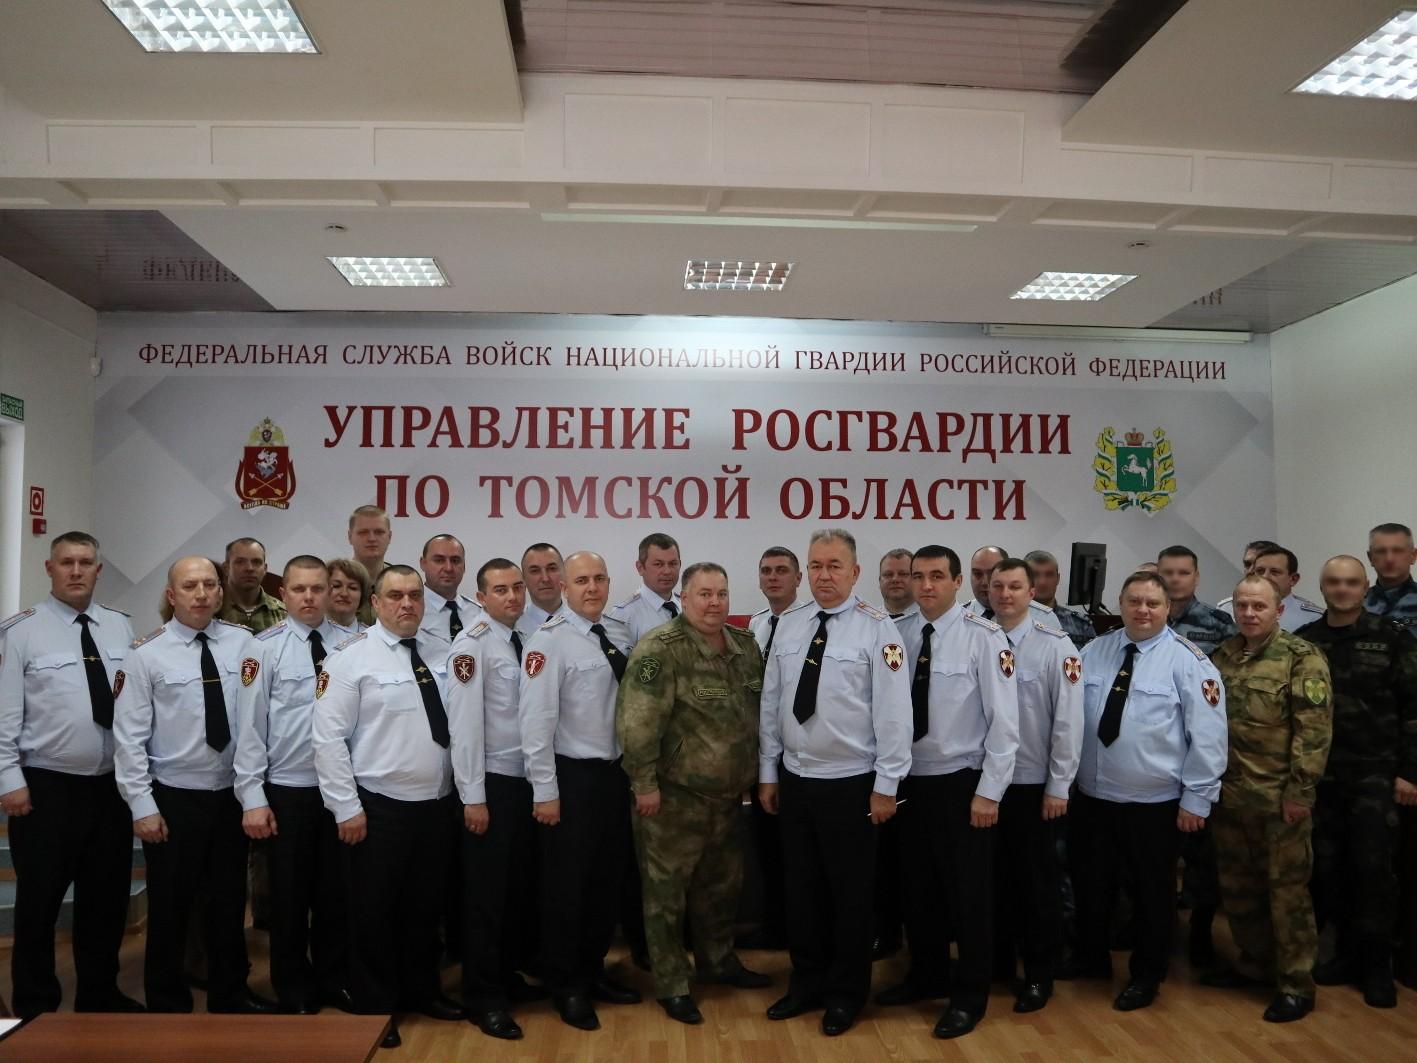 Томская Росгвардия подвела итоги СБД за 2019 год